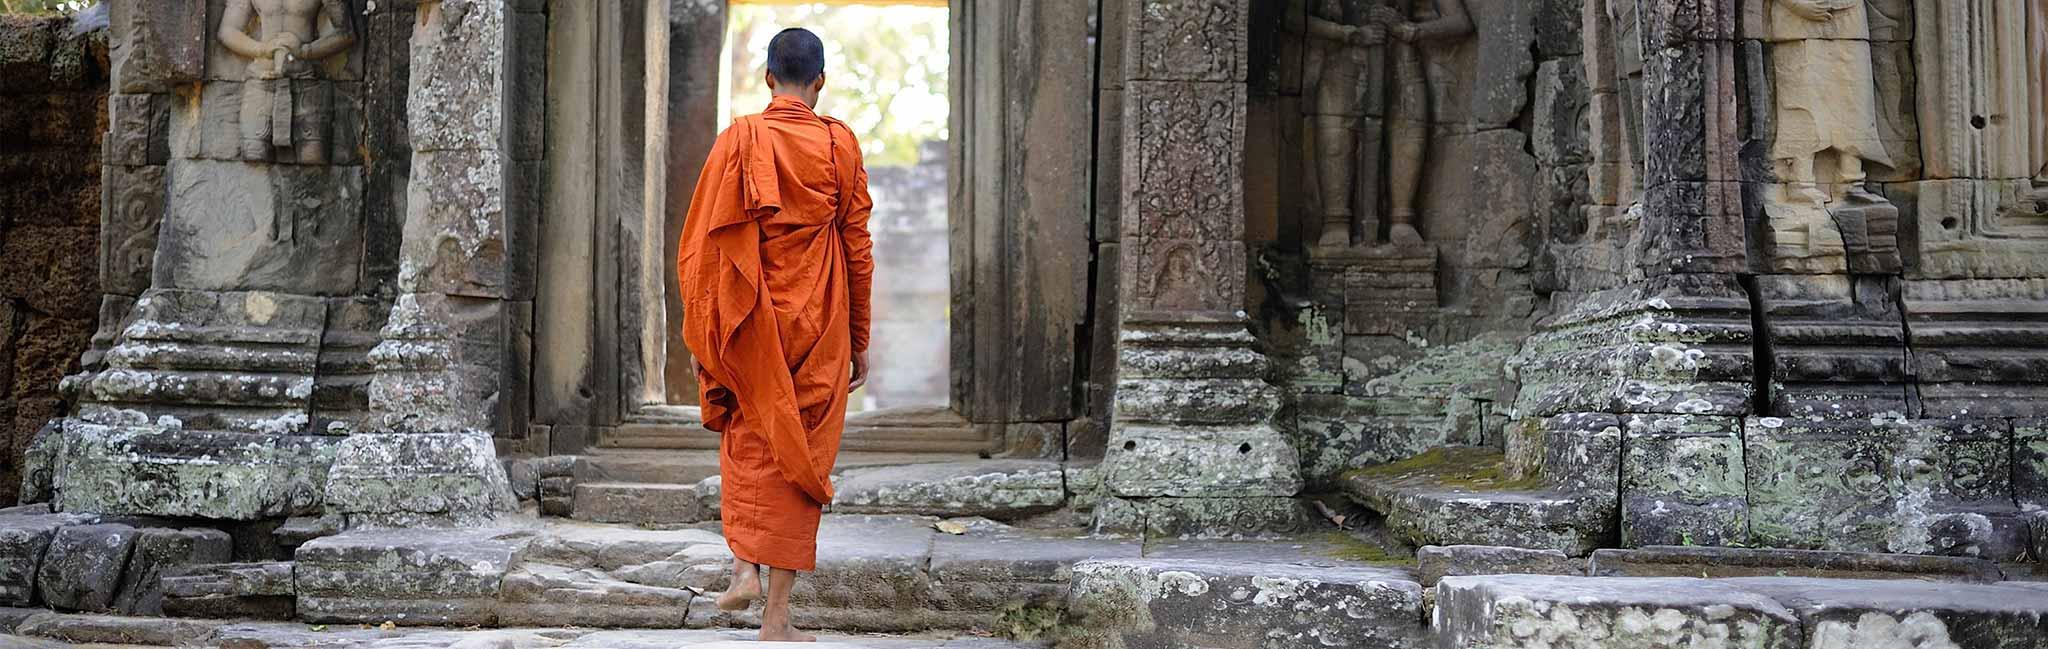 Cambodia Tour of Angkor's Banteay Kdei temple